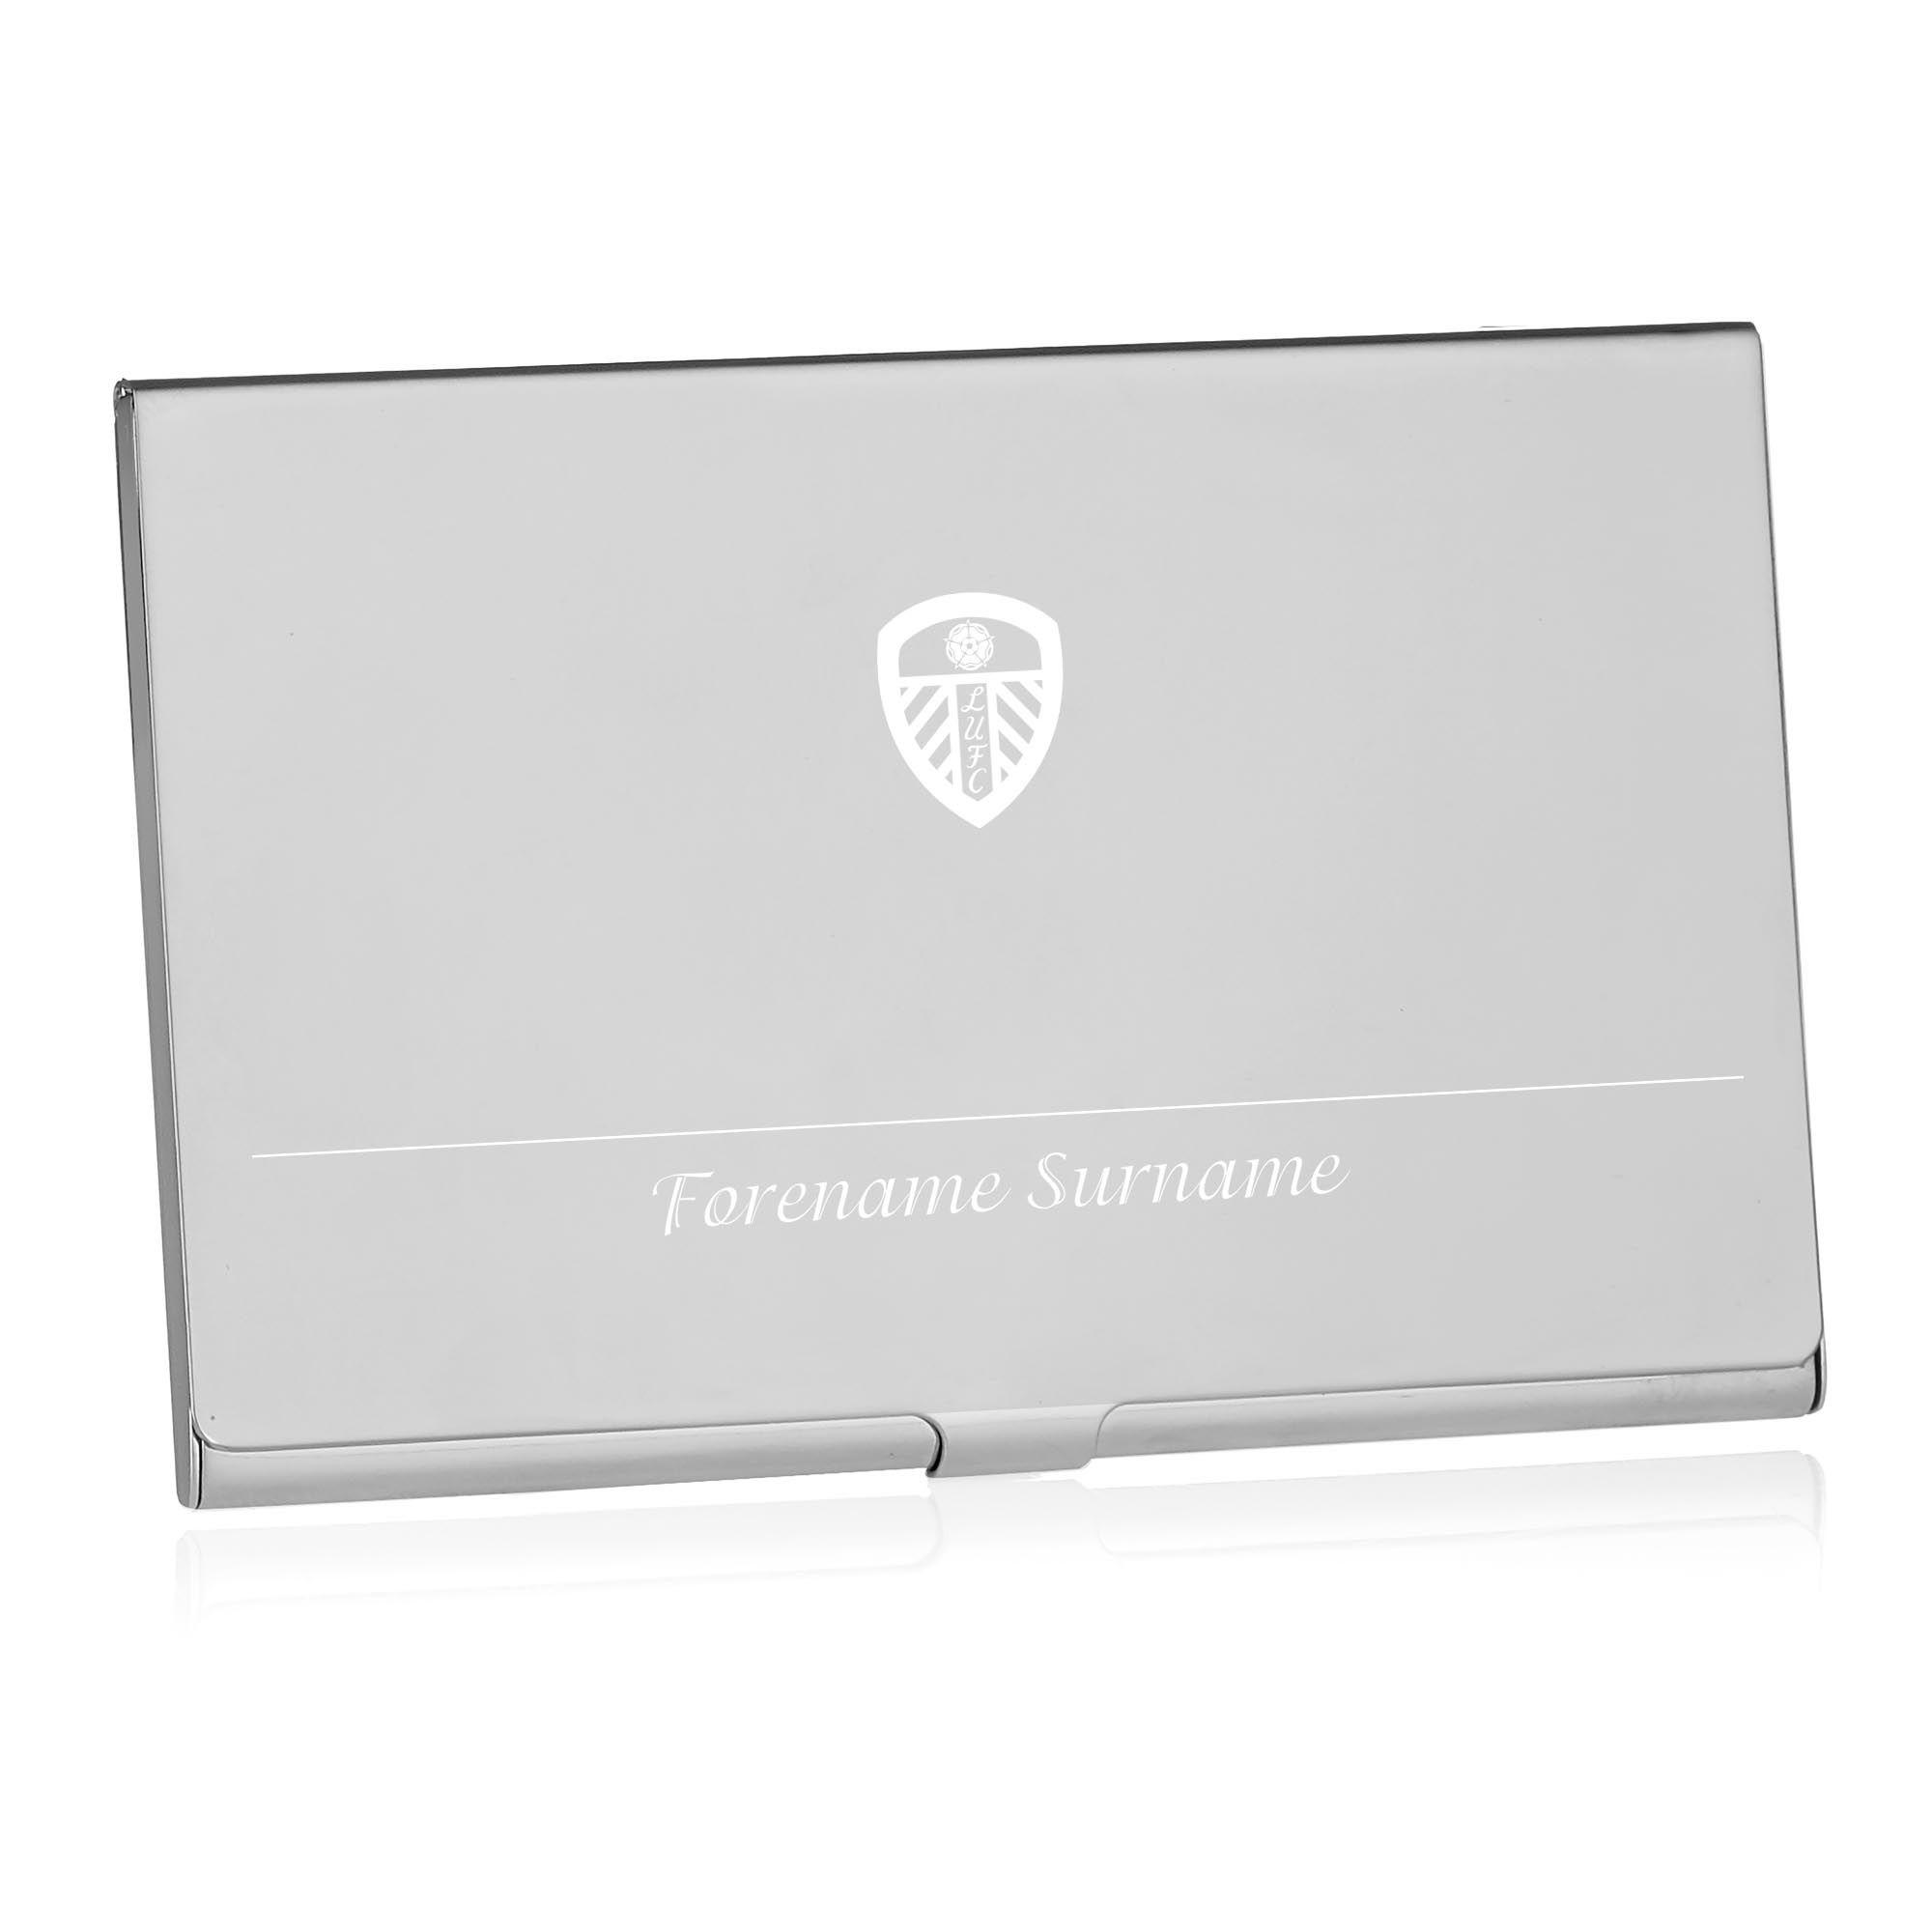 Leeds United FC Executive Business Card Holder | Personalised LUFC ...